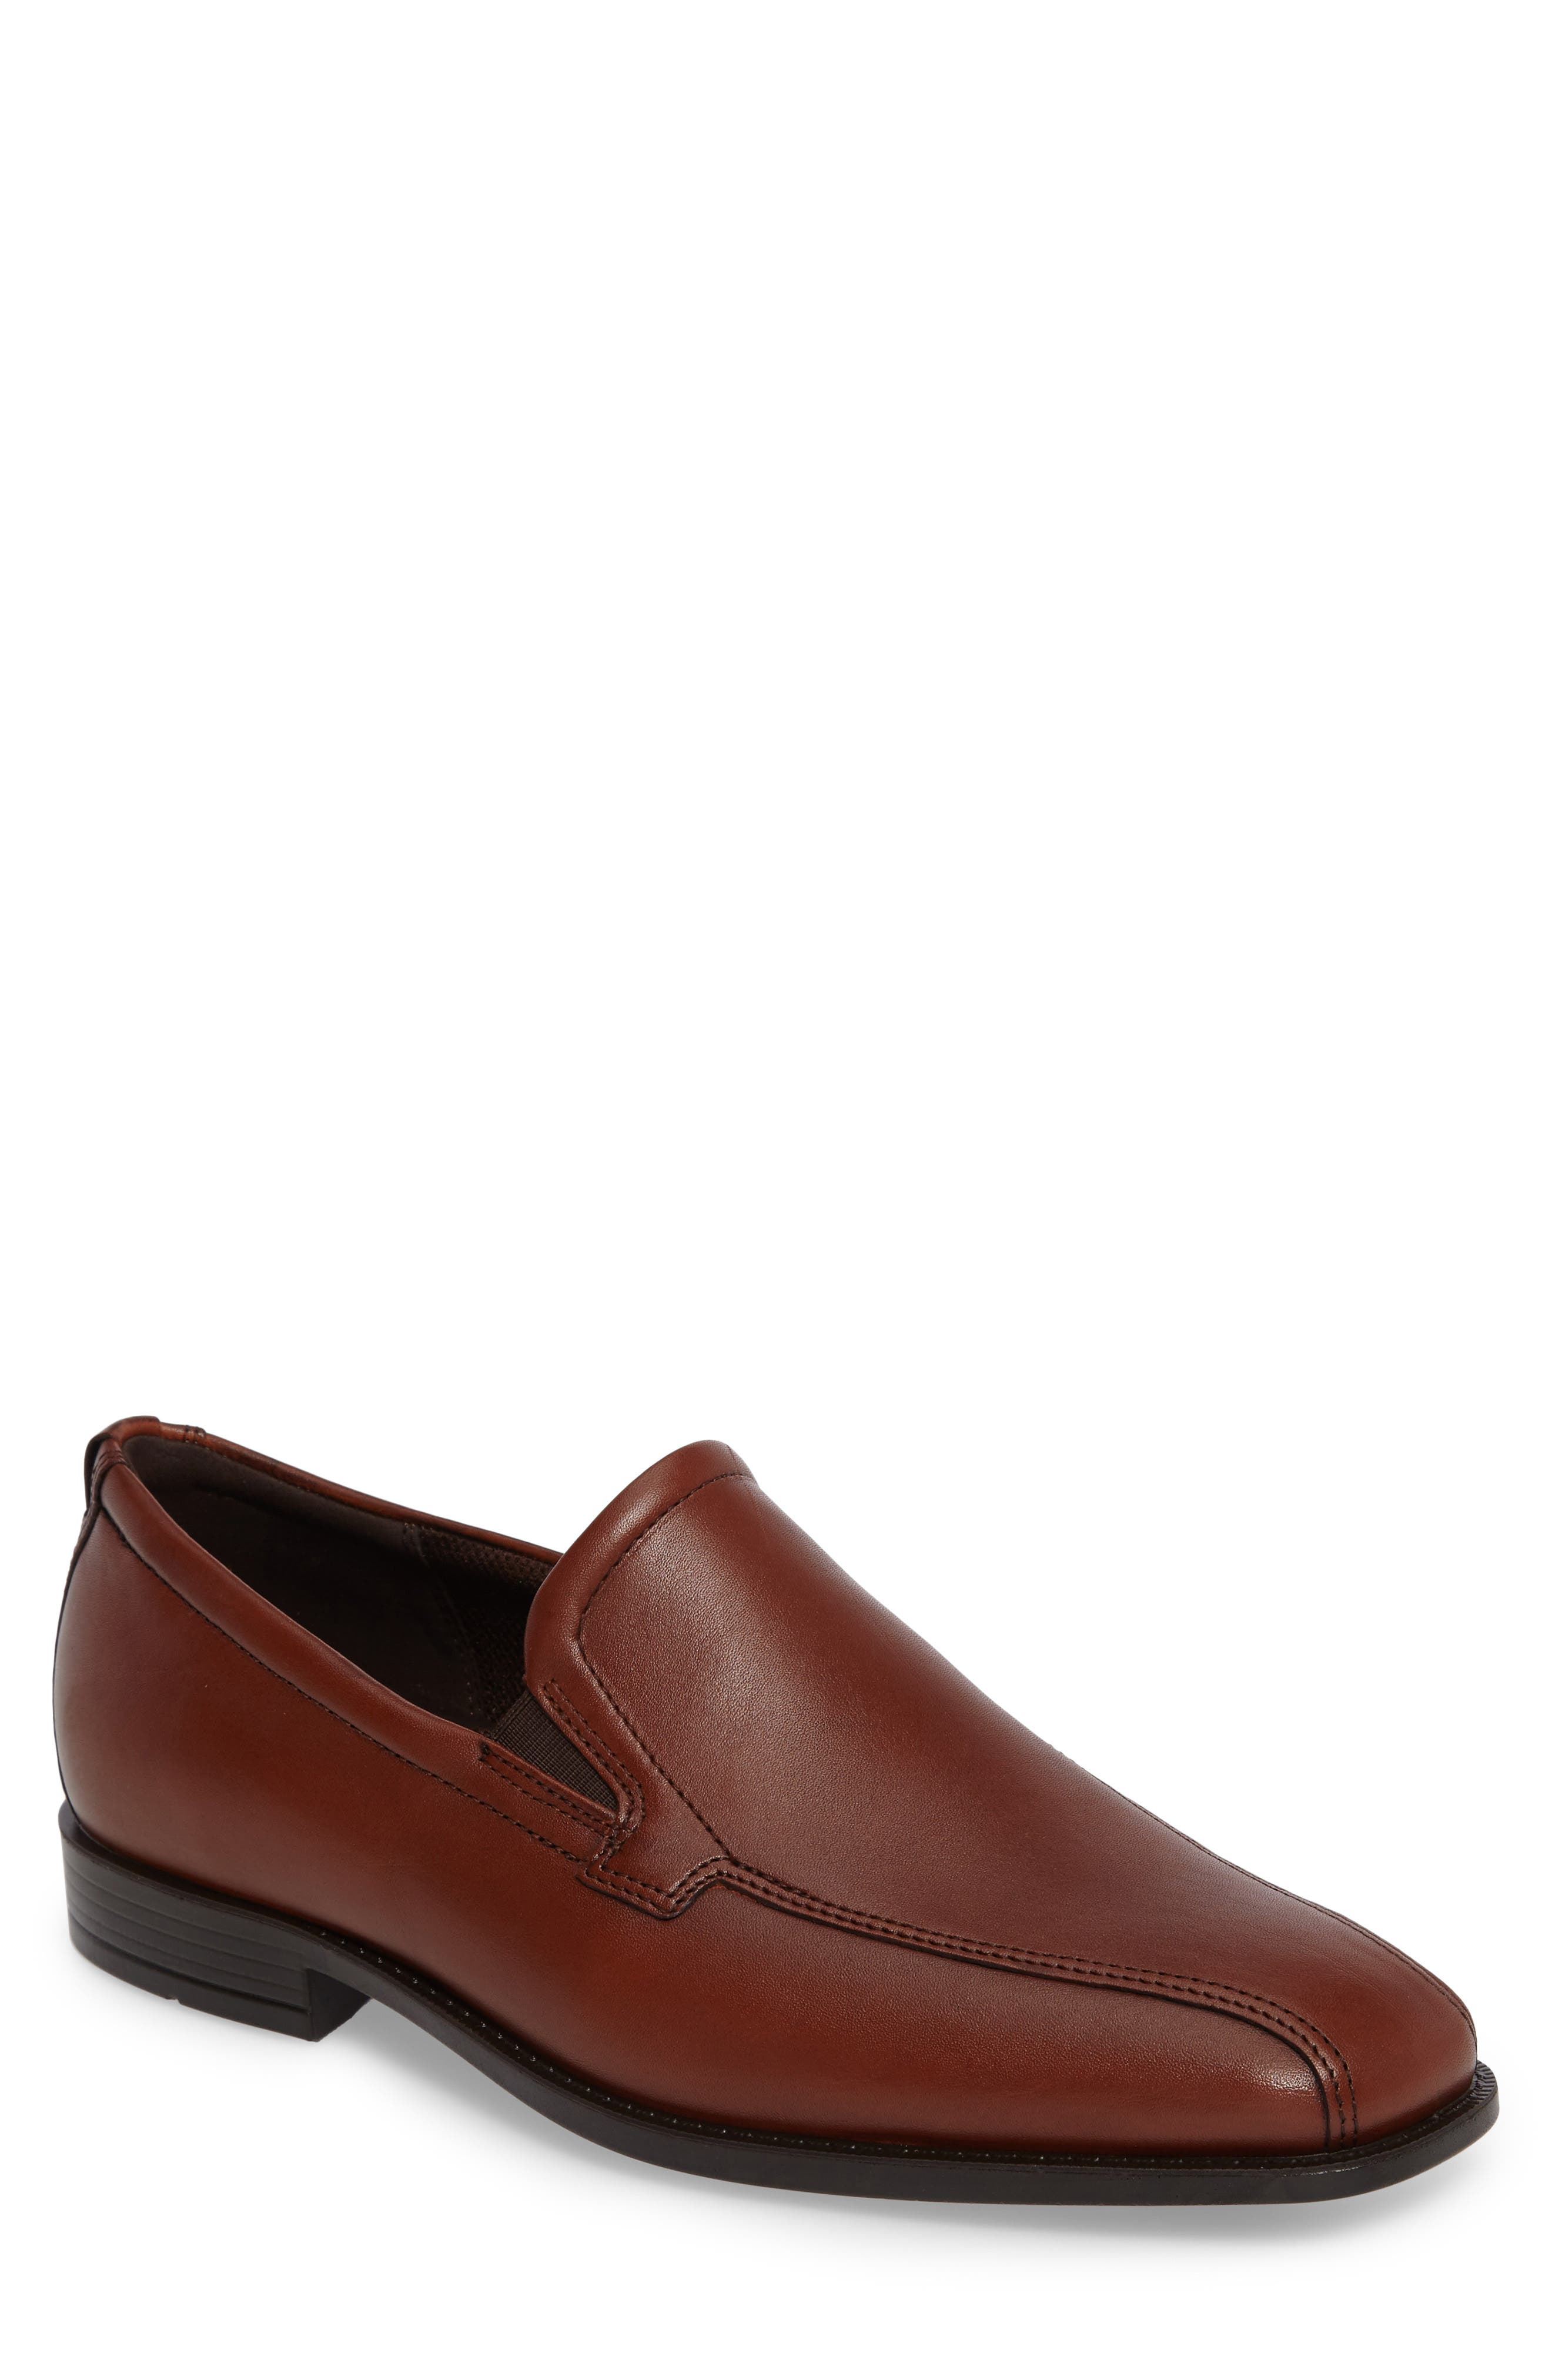 Edinburgh Venetian Loafer,                         Main,                         color, Cognac Leather